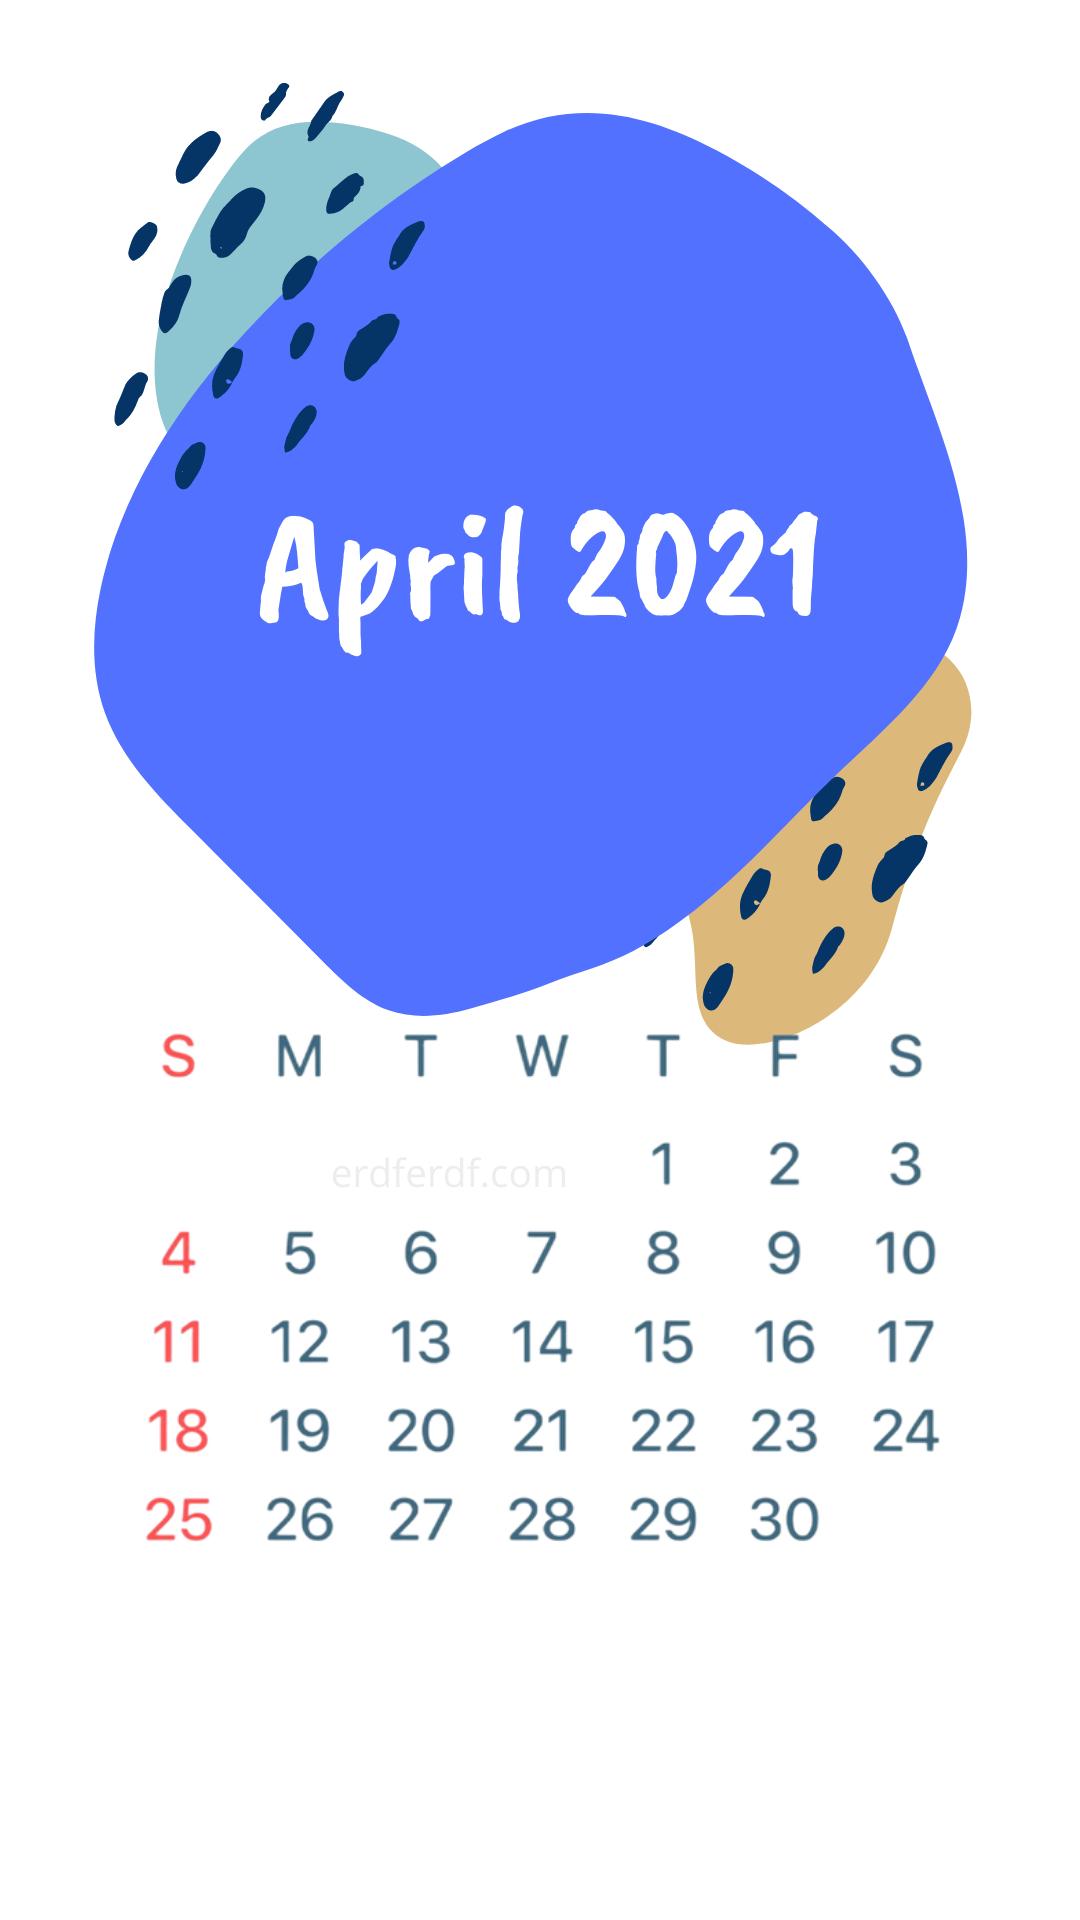 Iphone Wallpaper April 2021 Calendar White